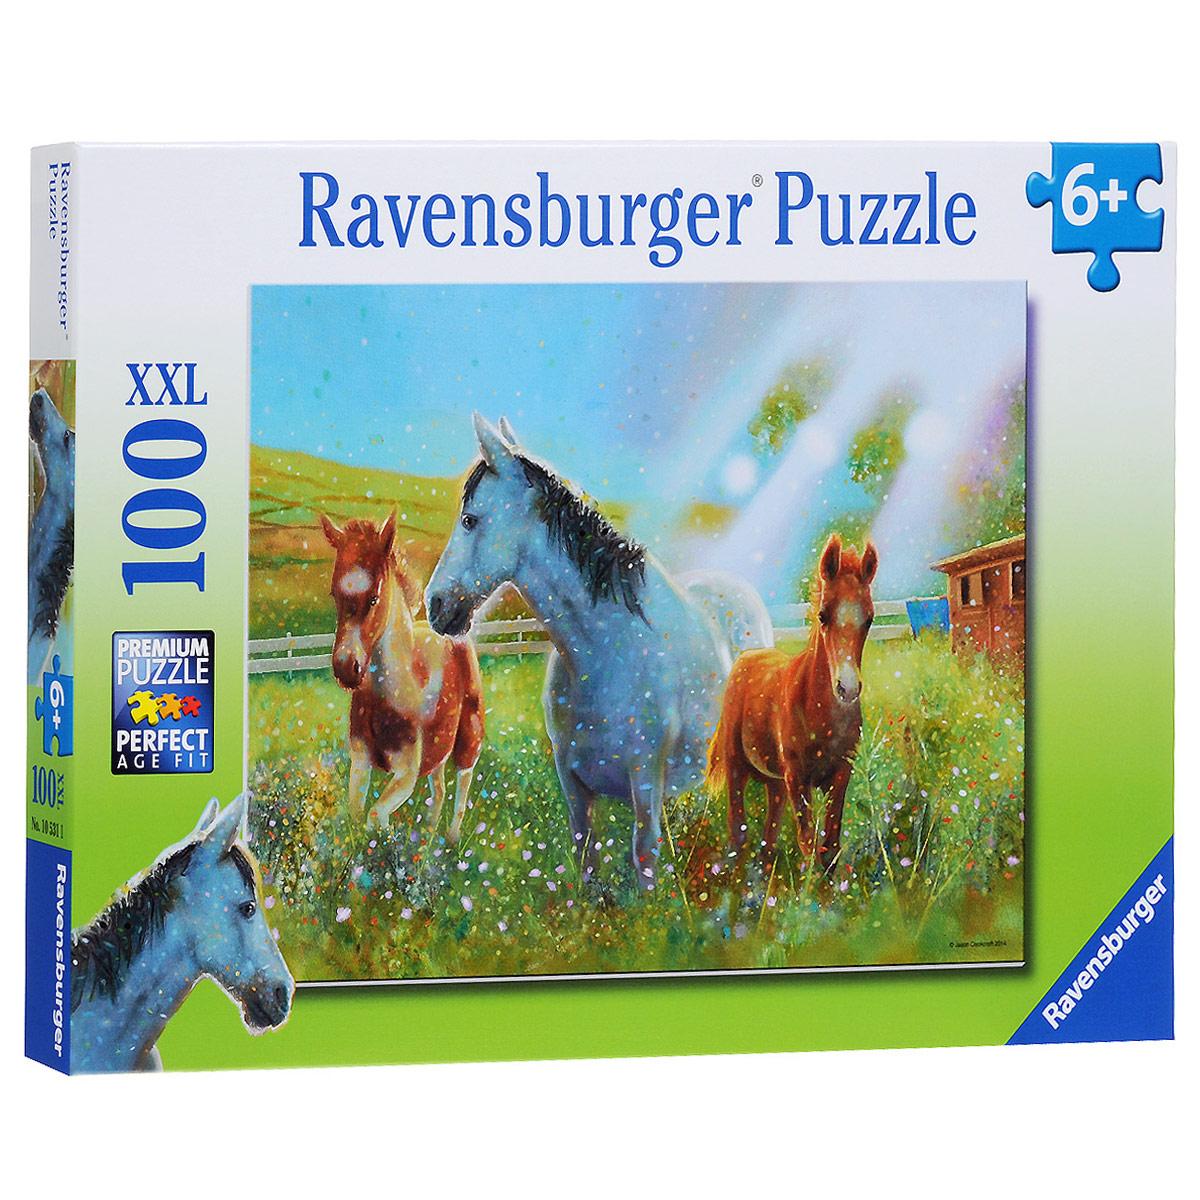 Ravensburger Лошади в лучах солнца. Пазл XXL, 100 элементов